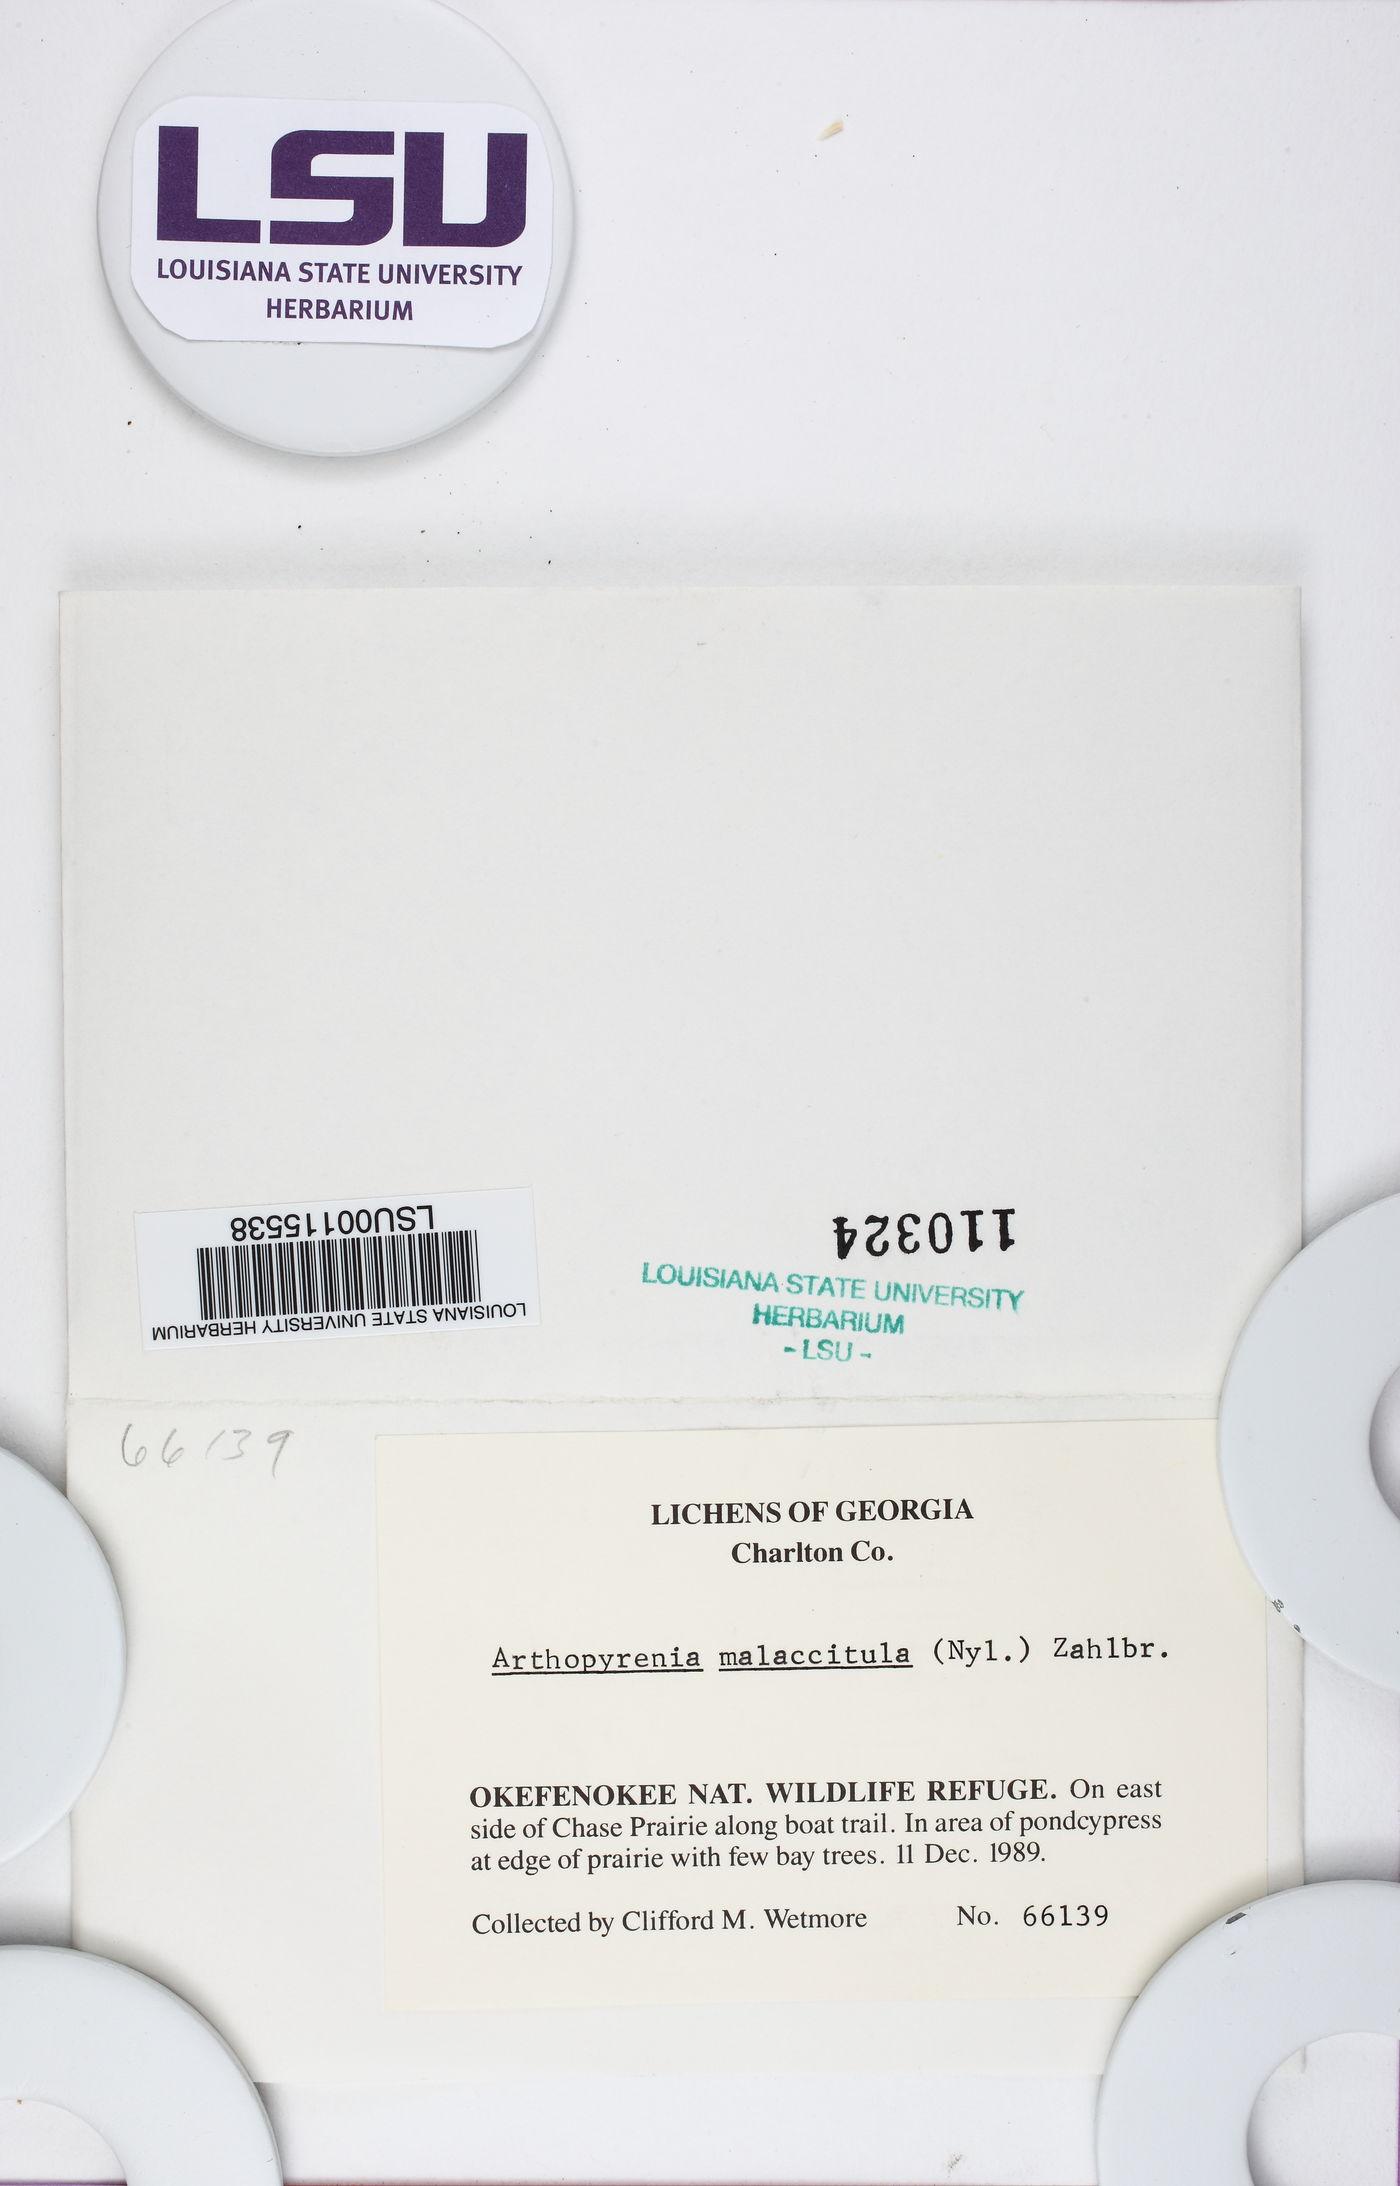 Constrictolumina malaccitula image